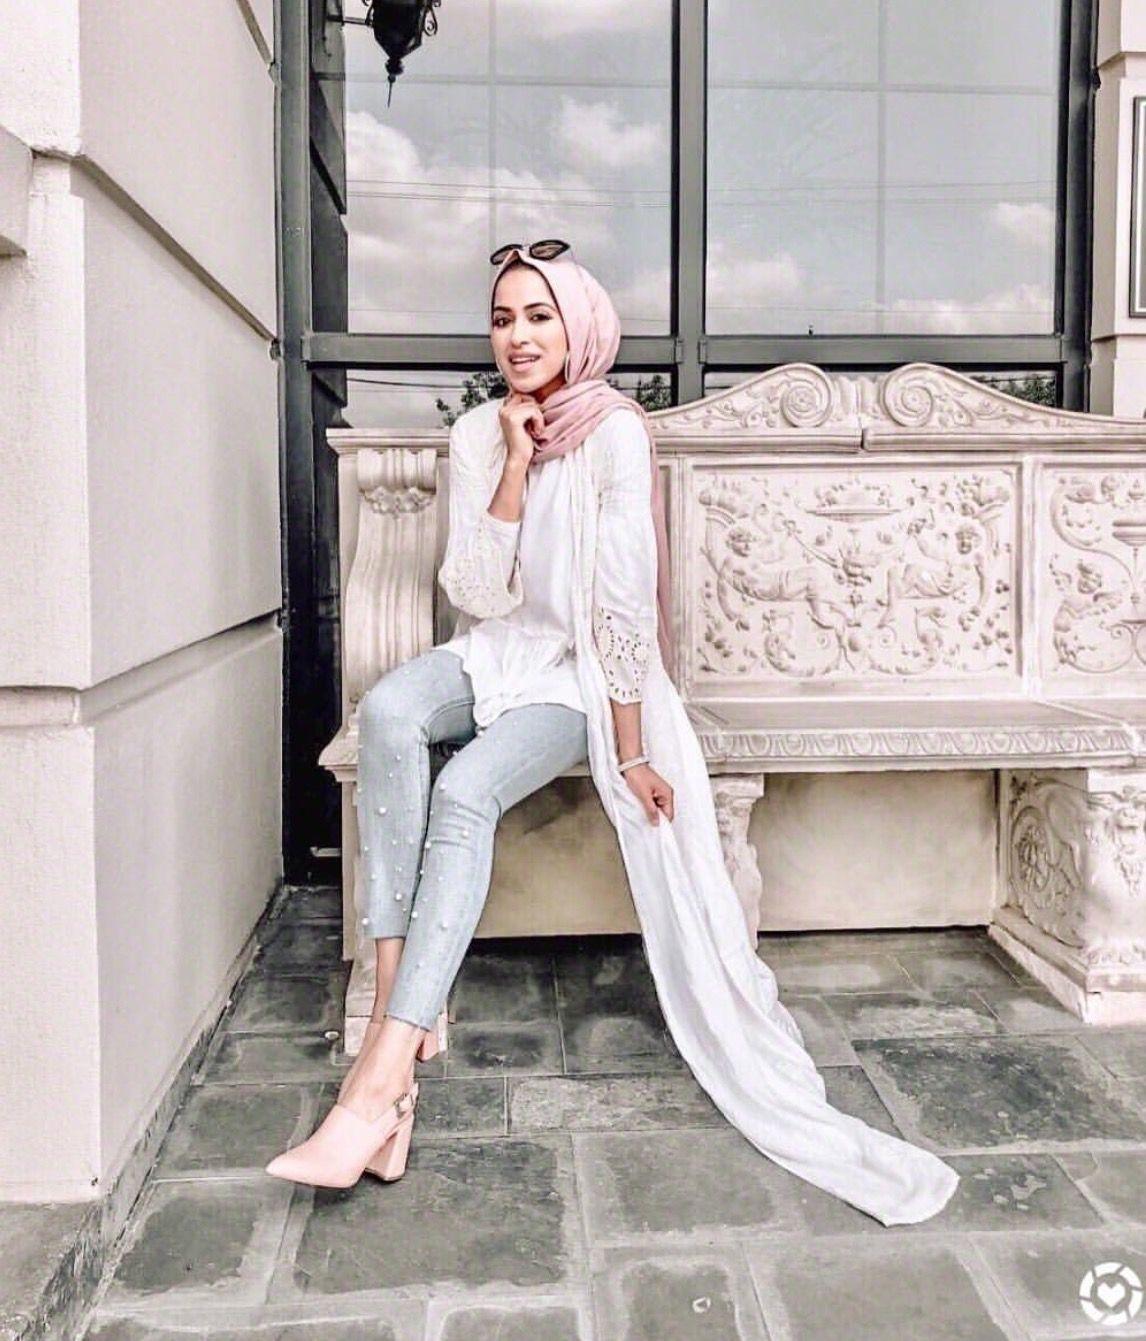 Pinterest: just11girls  Fashion, Modest fashion, Spring fashion casual